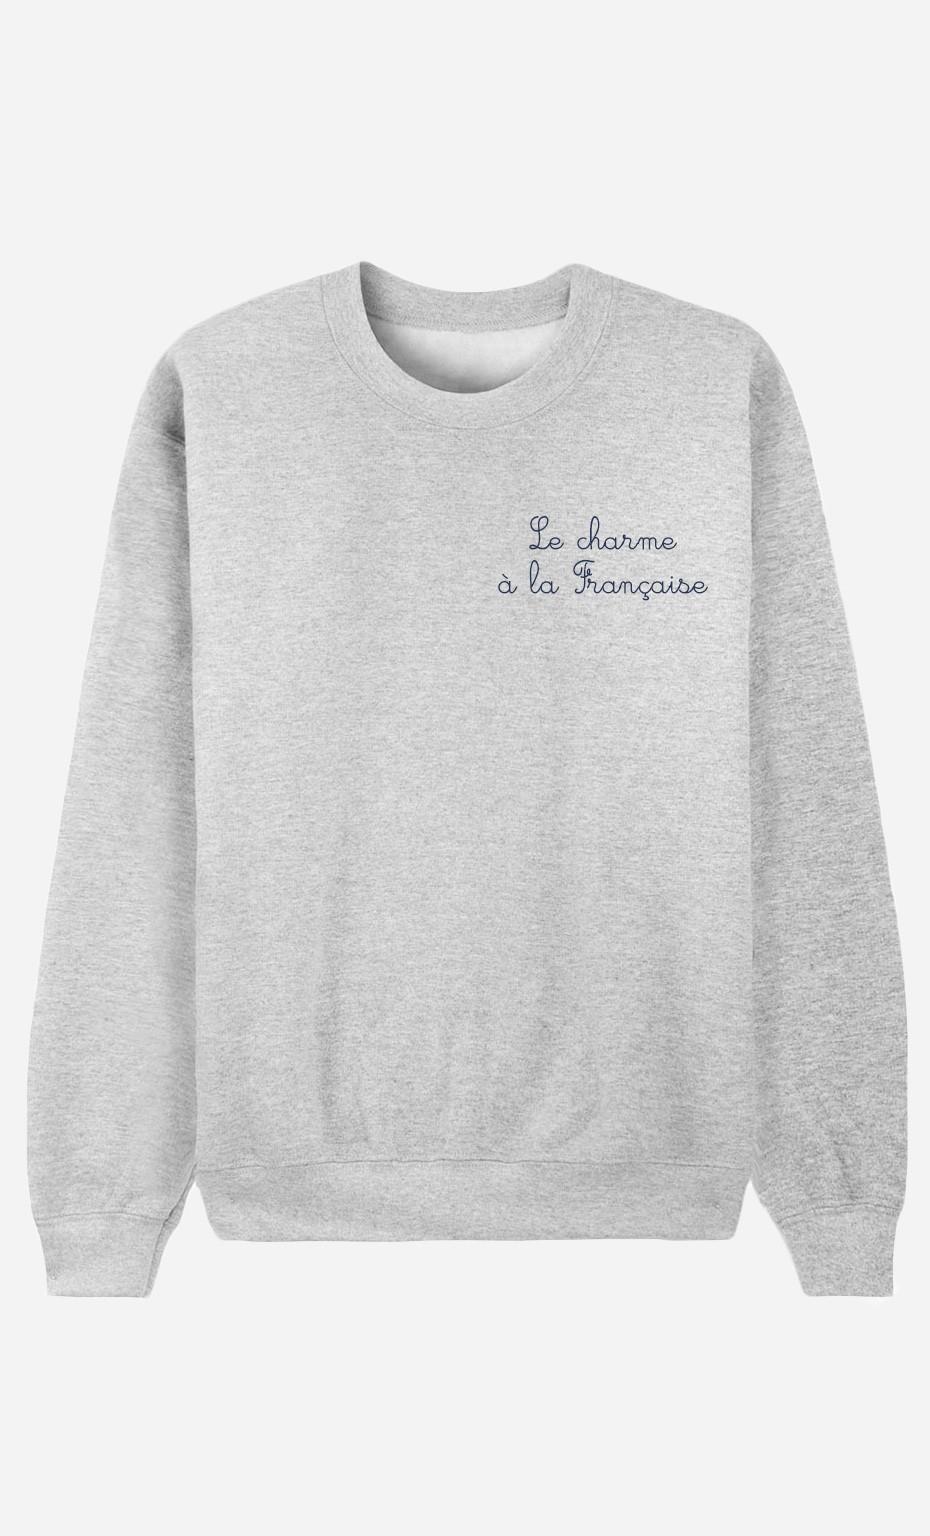 Sweatshirt Le Charme A La Française - embroidered